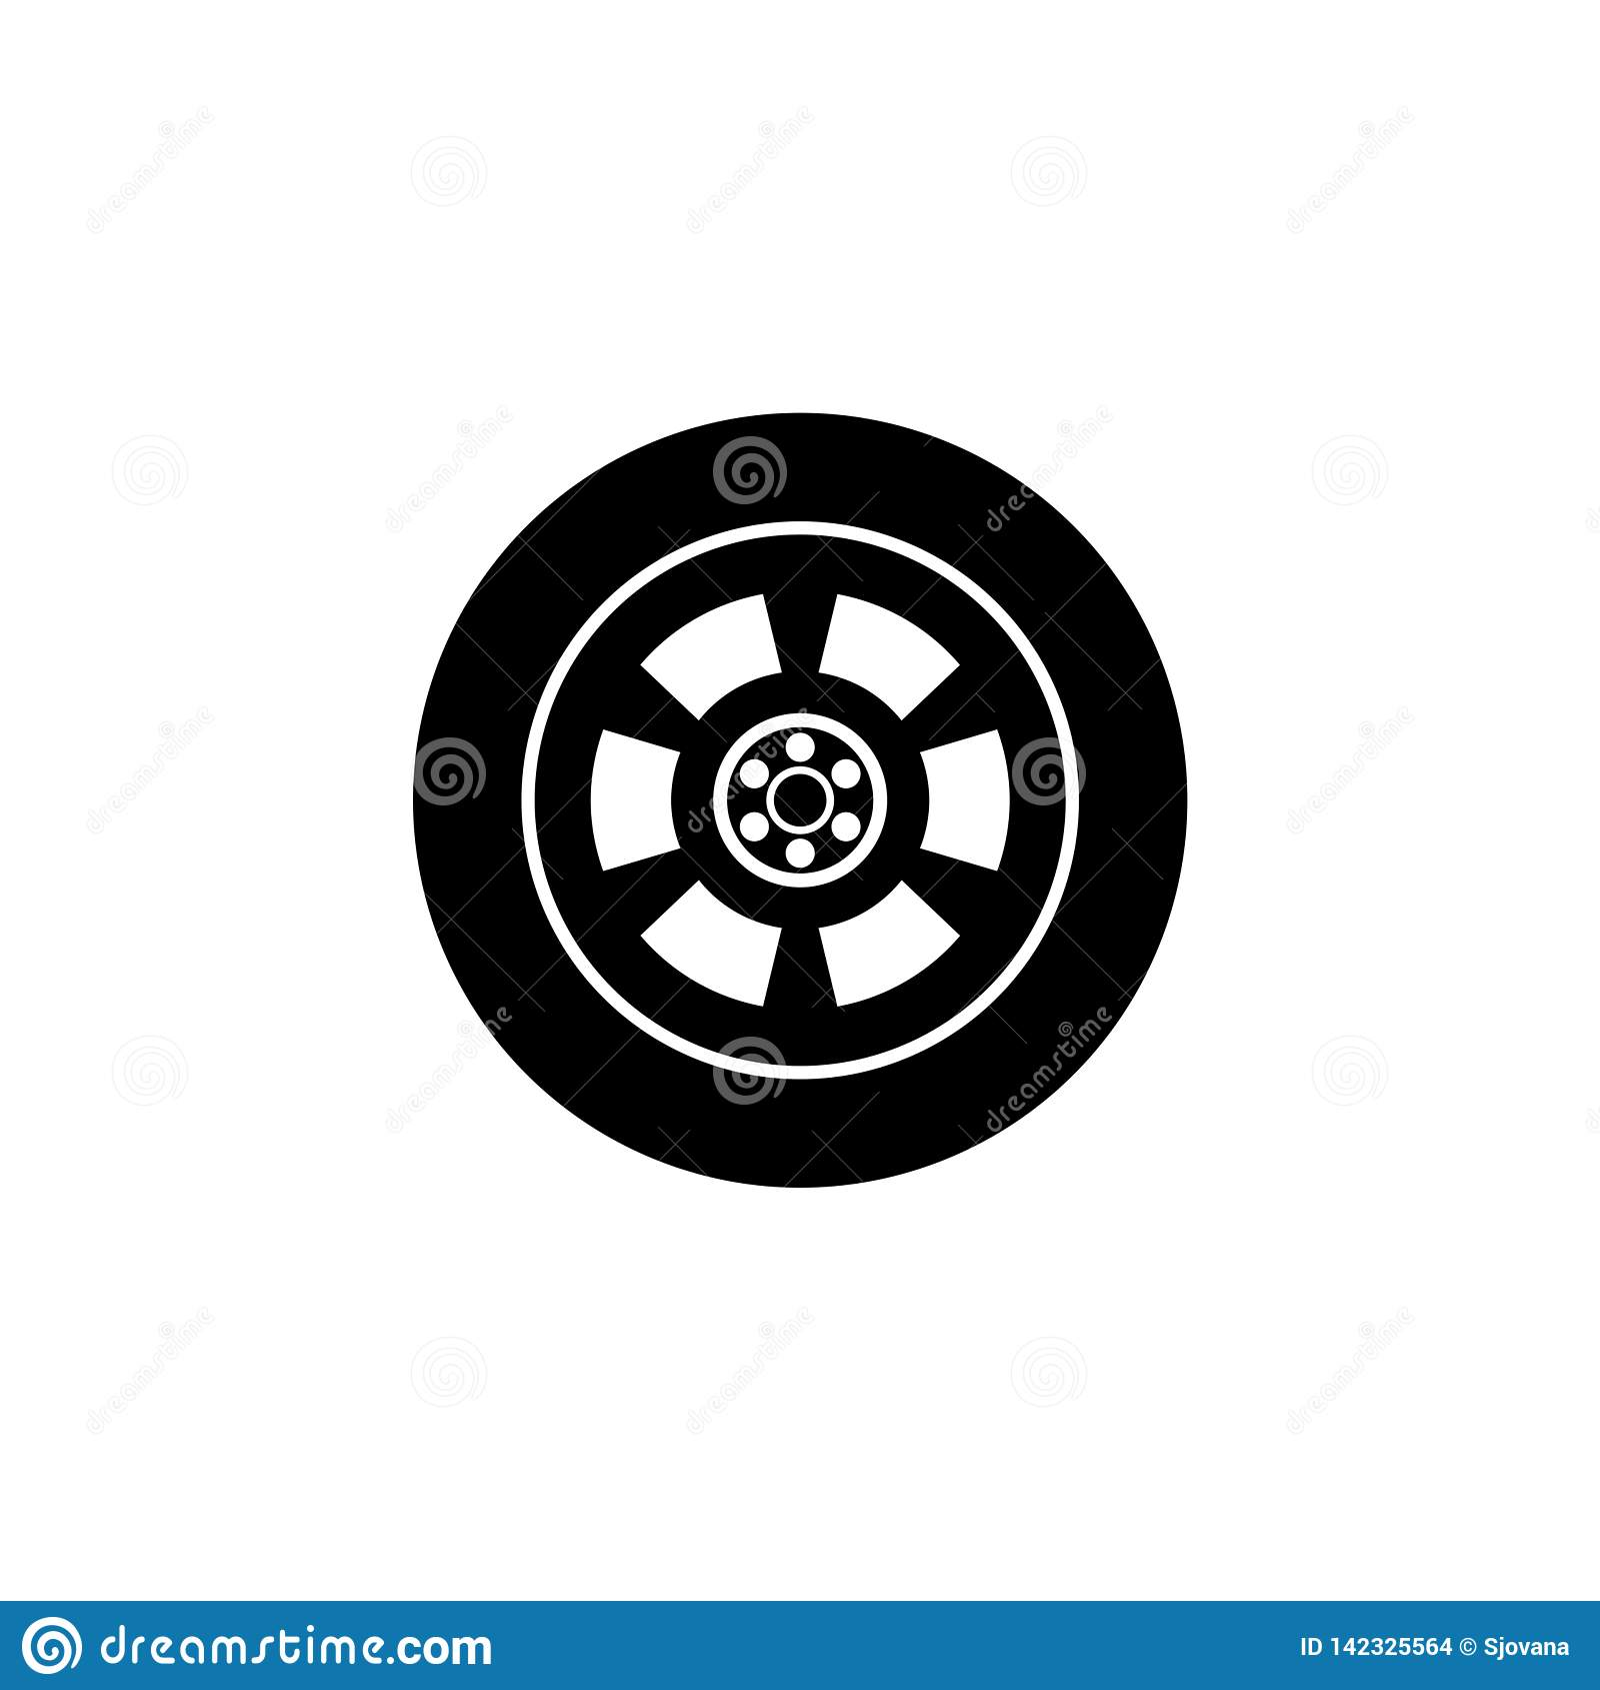 Car Wheel Abstract Icon Or Logo Stock Vector Illustration Of Disk Logo 142325564